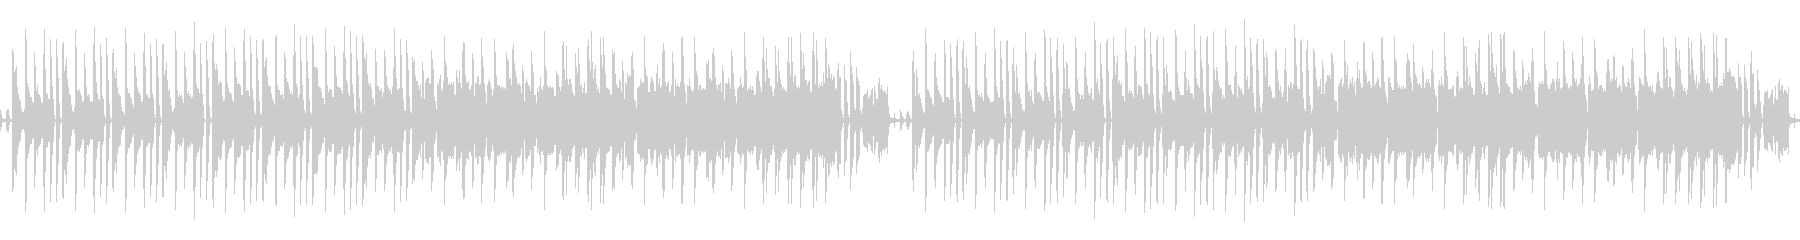 8bit・チップチューン風おバカメロディの未再生の波形